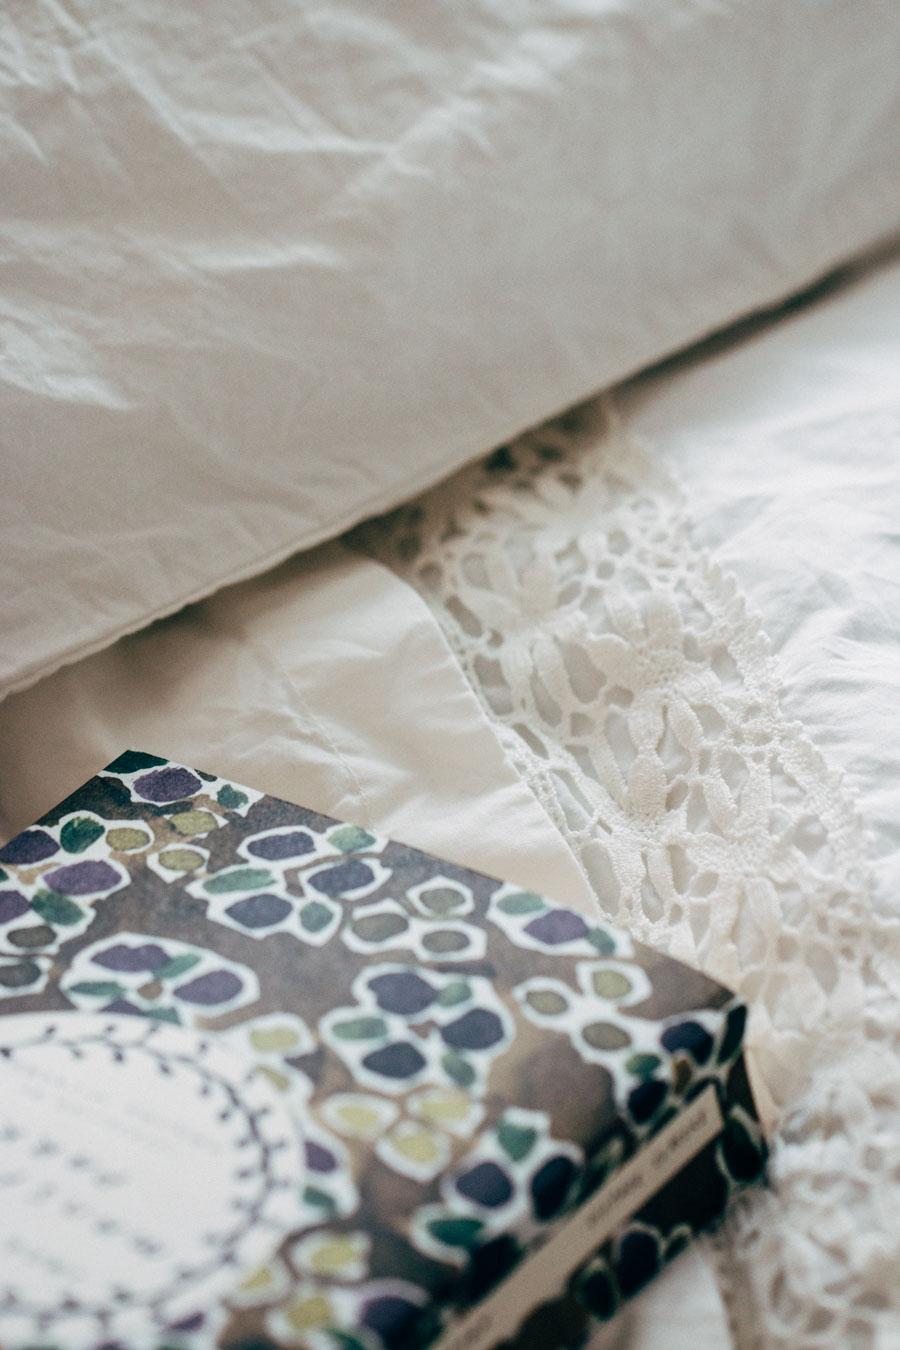 Ethical Autumn bedroom update